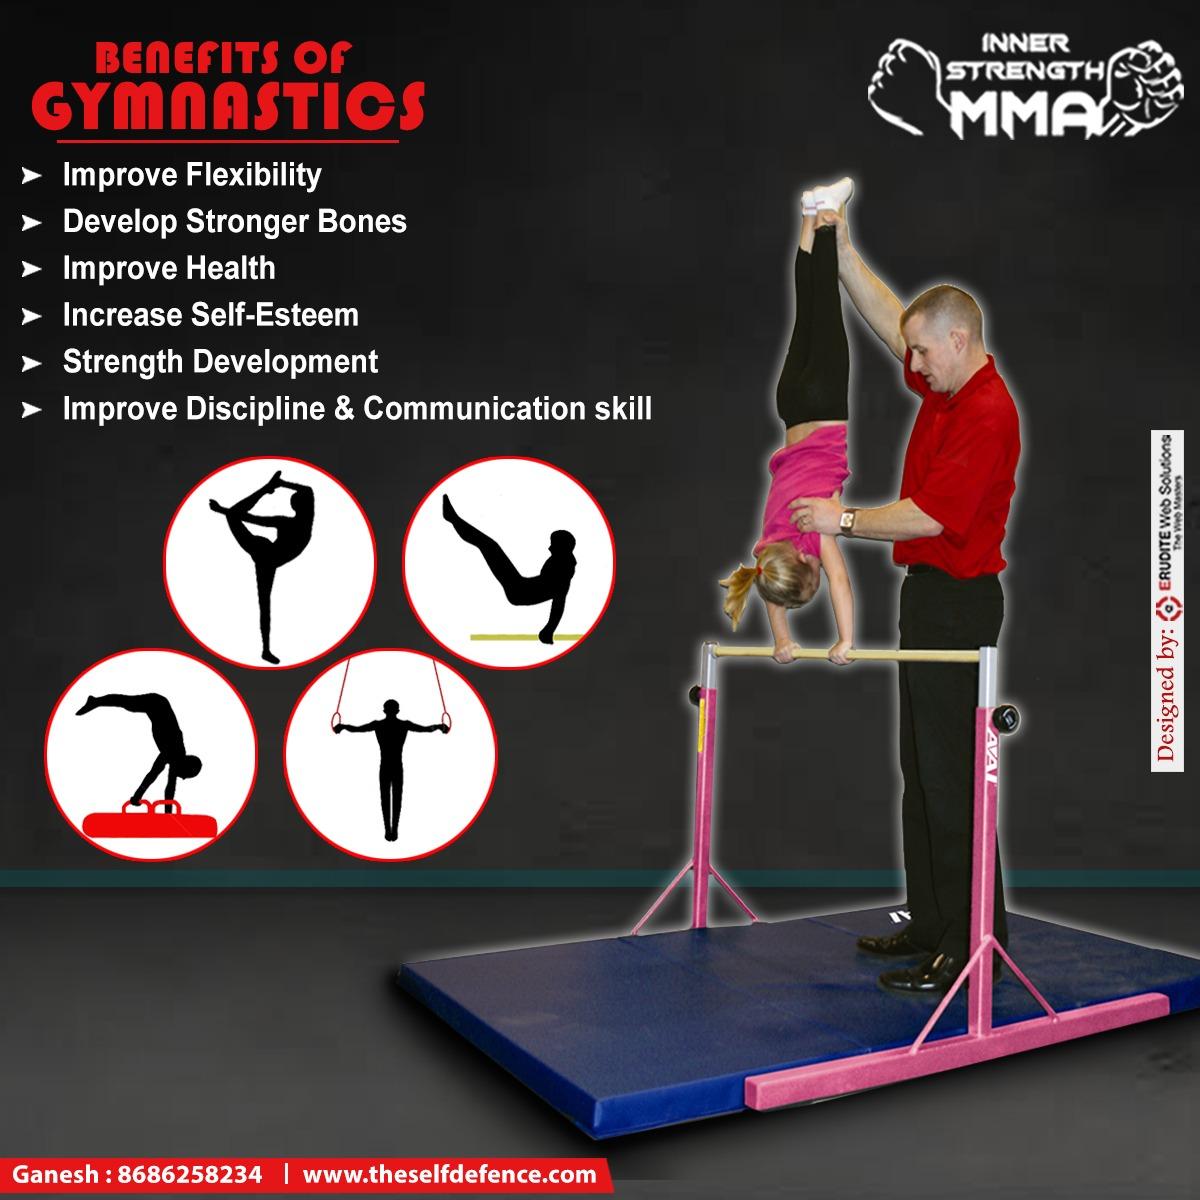 Become mentally and physically fit with gymnastics. Join MMA to learn martial arts.  . . . . . . . . . . . . . . .  #theselfdefence #judo #gymnastics #kickboxing #gymnastics #muaythaiboxing #jujitsu #shaolinkungfu  #kalari #kuttuvarisal #varmakalai  #kalarpayyattu #oldestpic.twitter.com/hAZpQV5laa